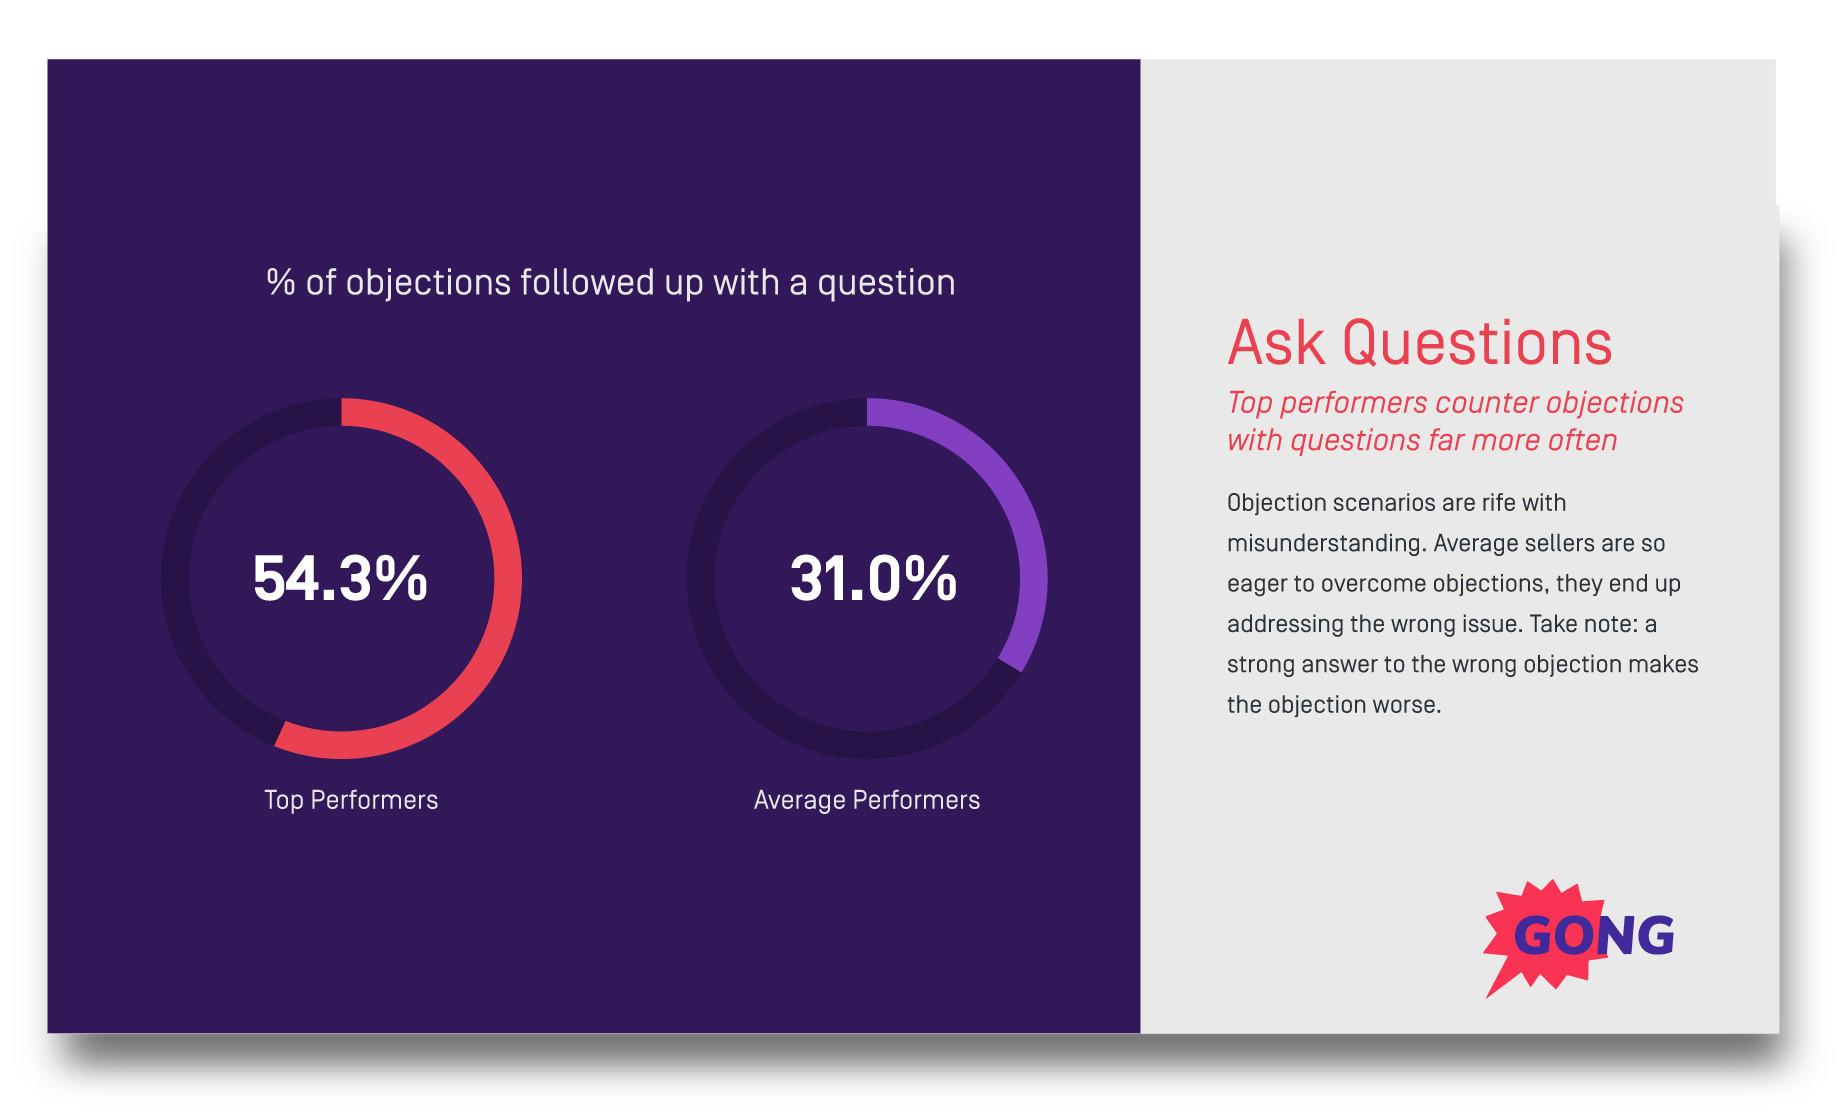 Objection handling question sales technique